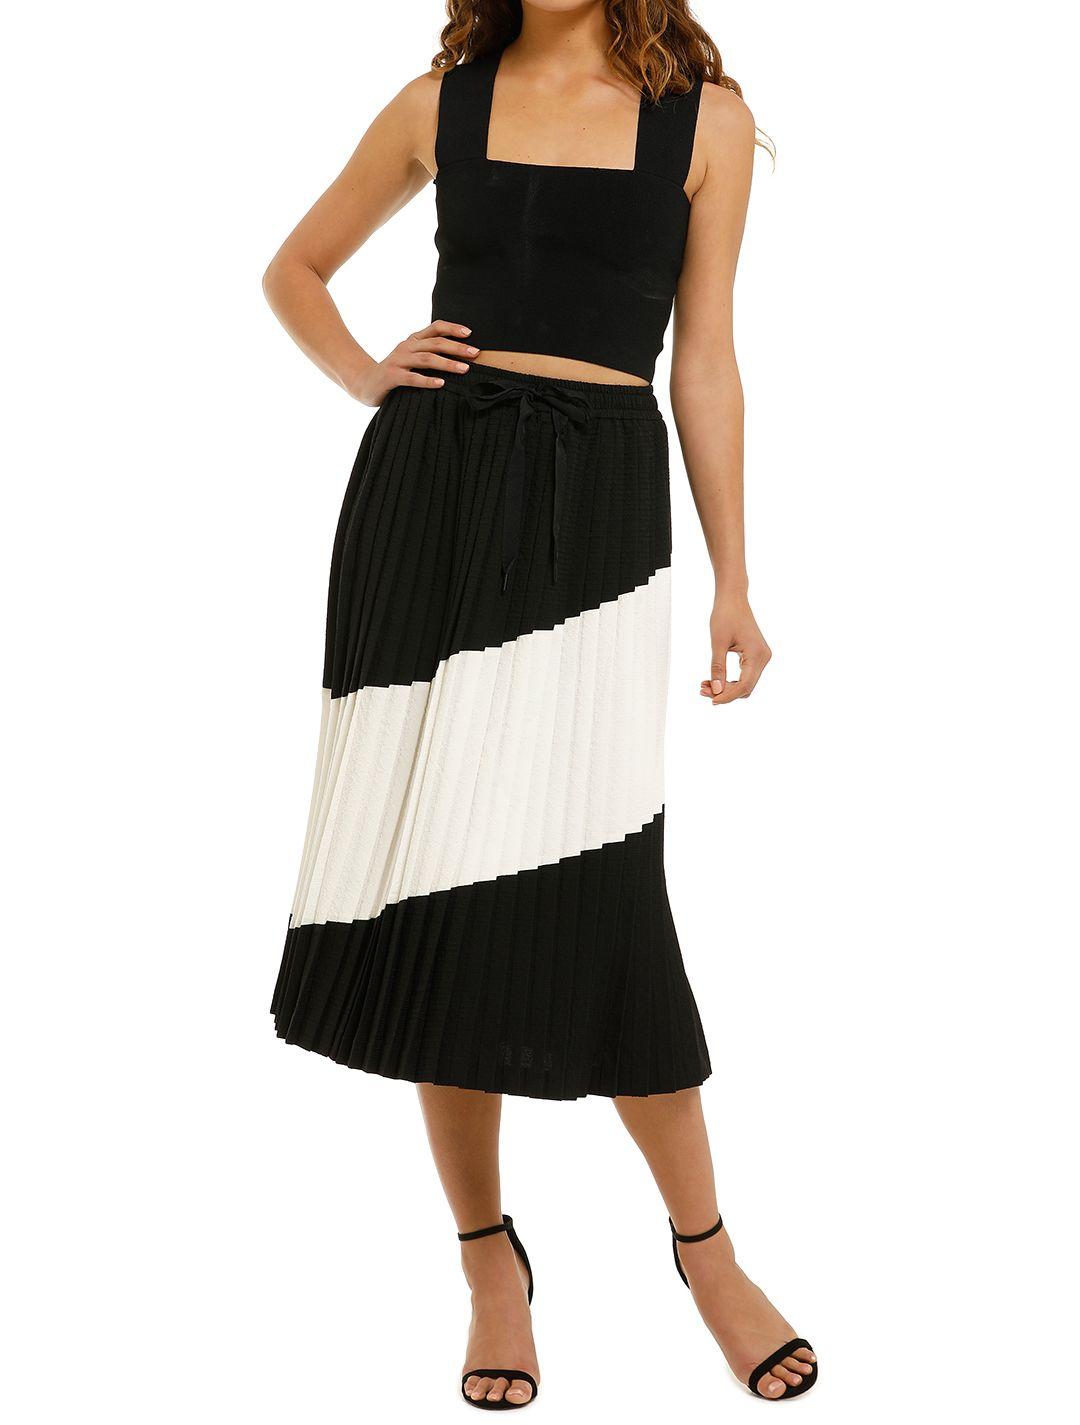 Rebecca-Vallance-Gia-Skirt-Black-And-White-Front